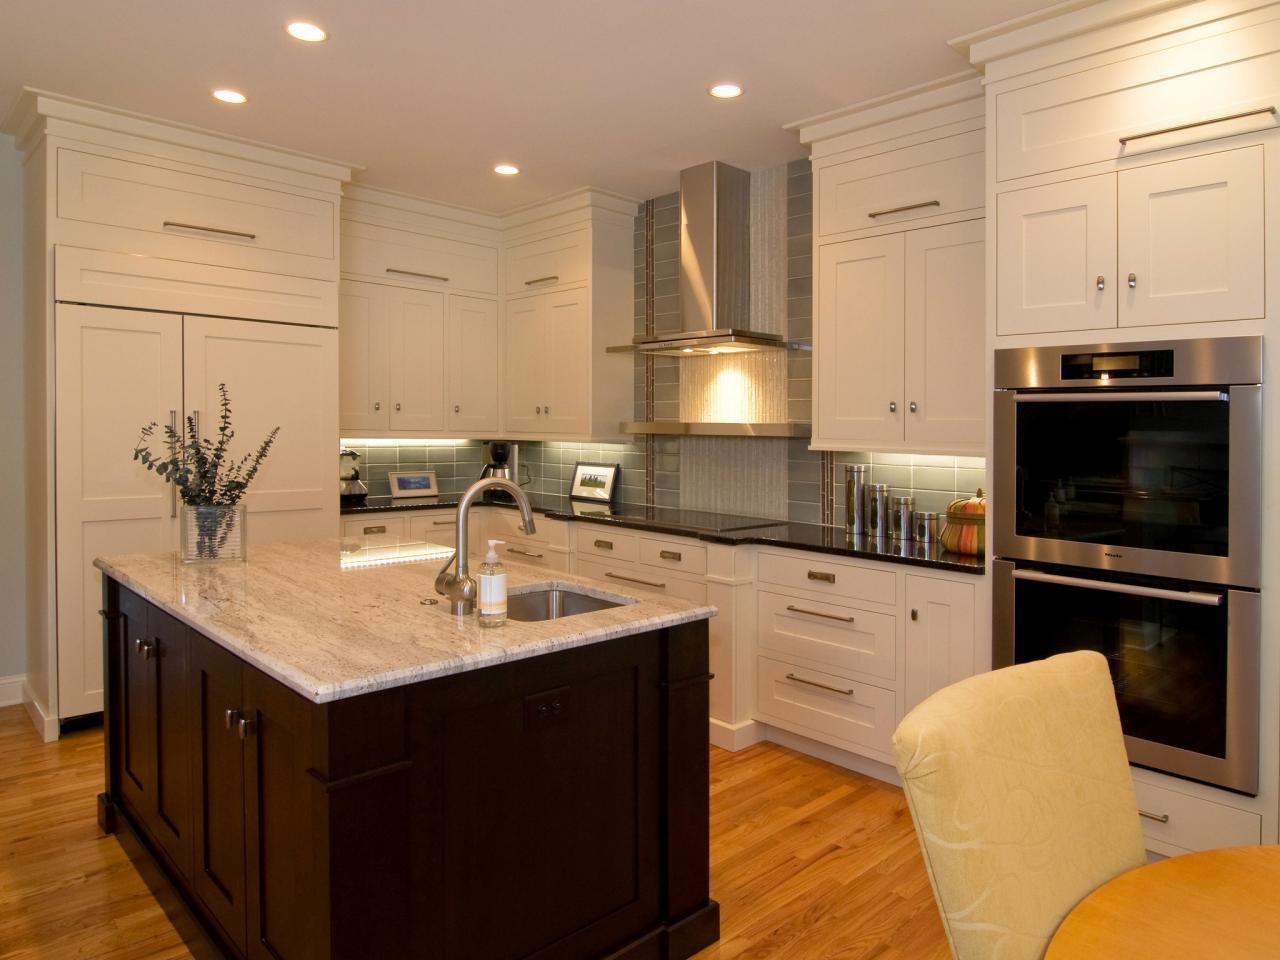 CI mb hargrove shaker kitchen lead image 4x3.jpg.rend .hgtvcom.1280.960